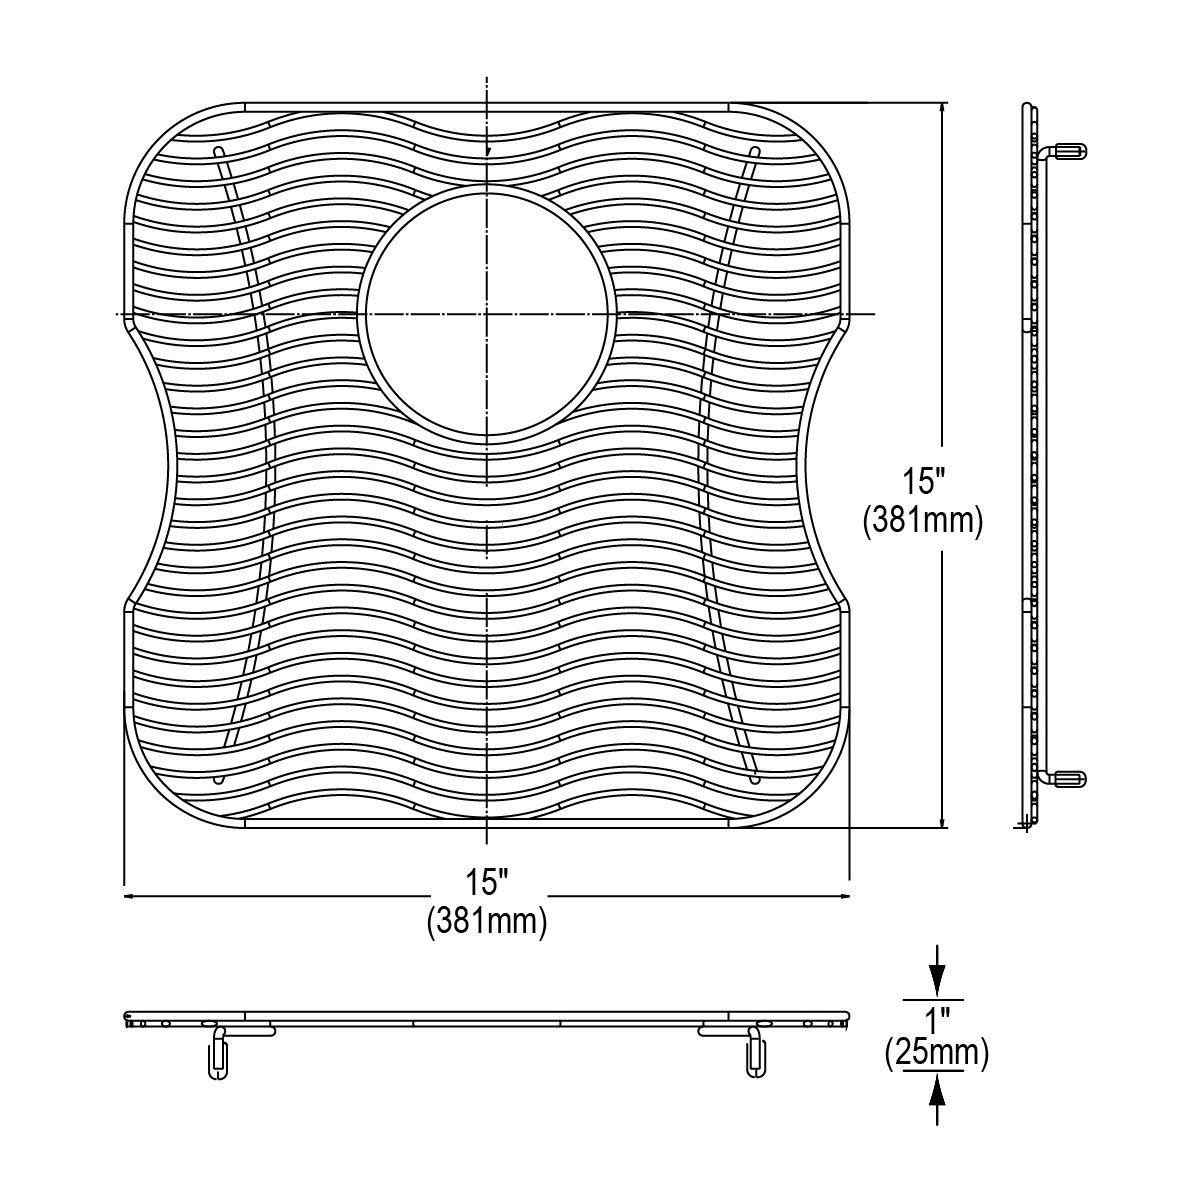 Elkay LKWOBG1616SS Wavy Wire Bottom Grid, Stainless Steel